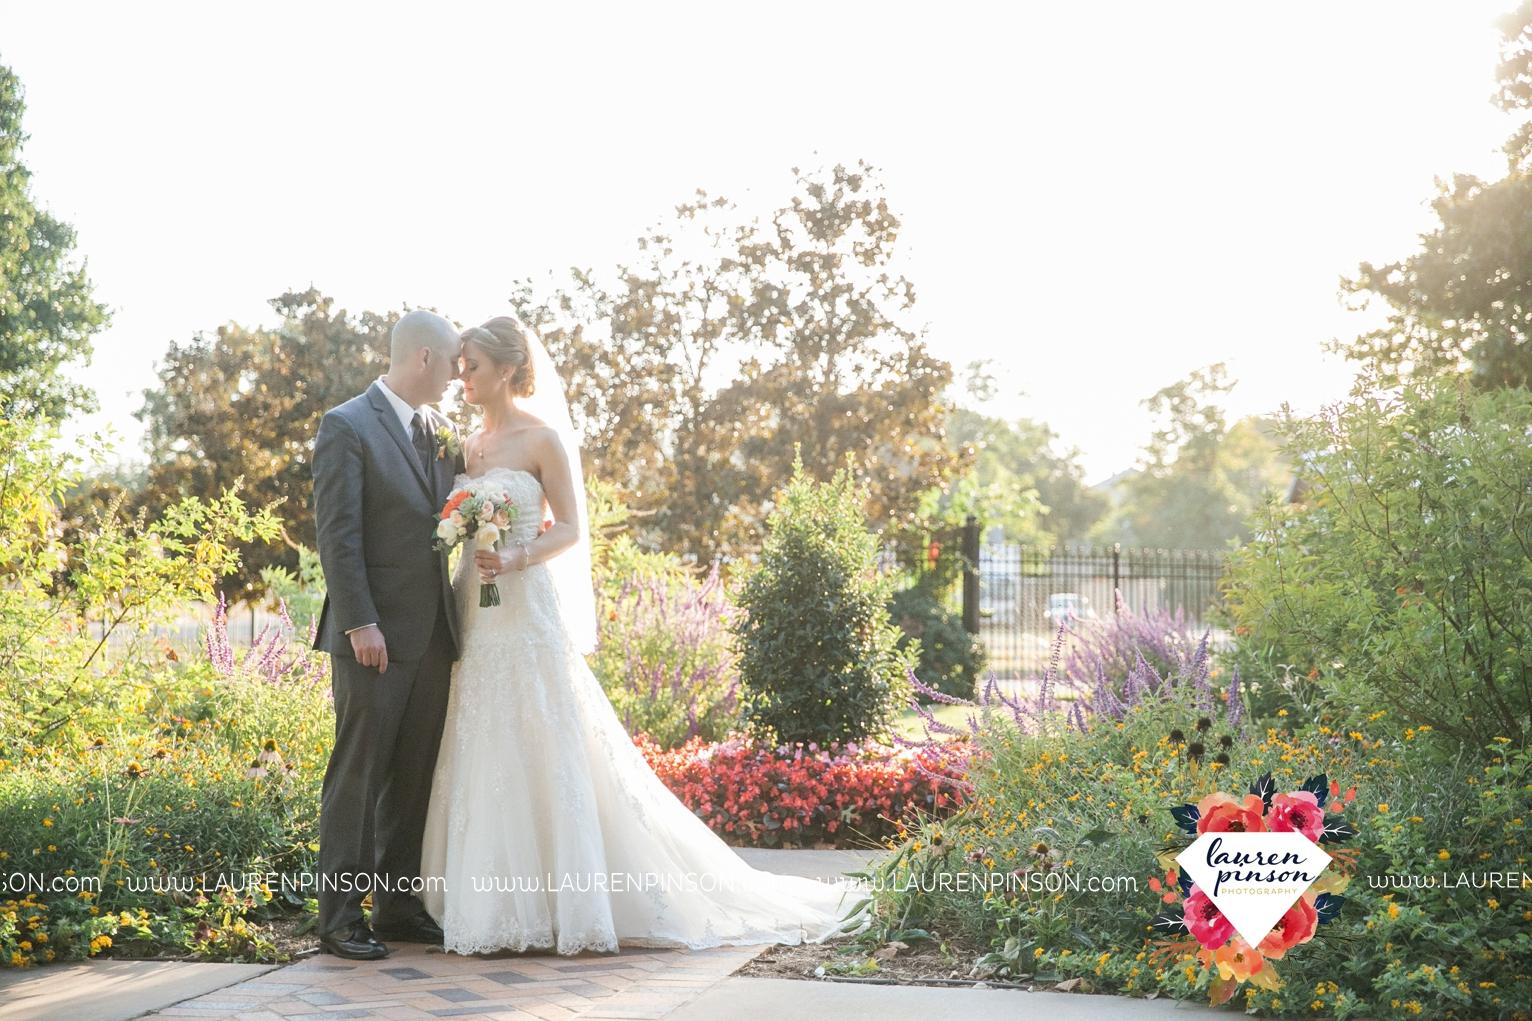 kemp-center-for-the-arts-wichita-falls-texas-wedding-photographer-fall-wedding-pumpkins-169.jpg